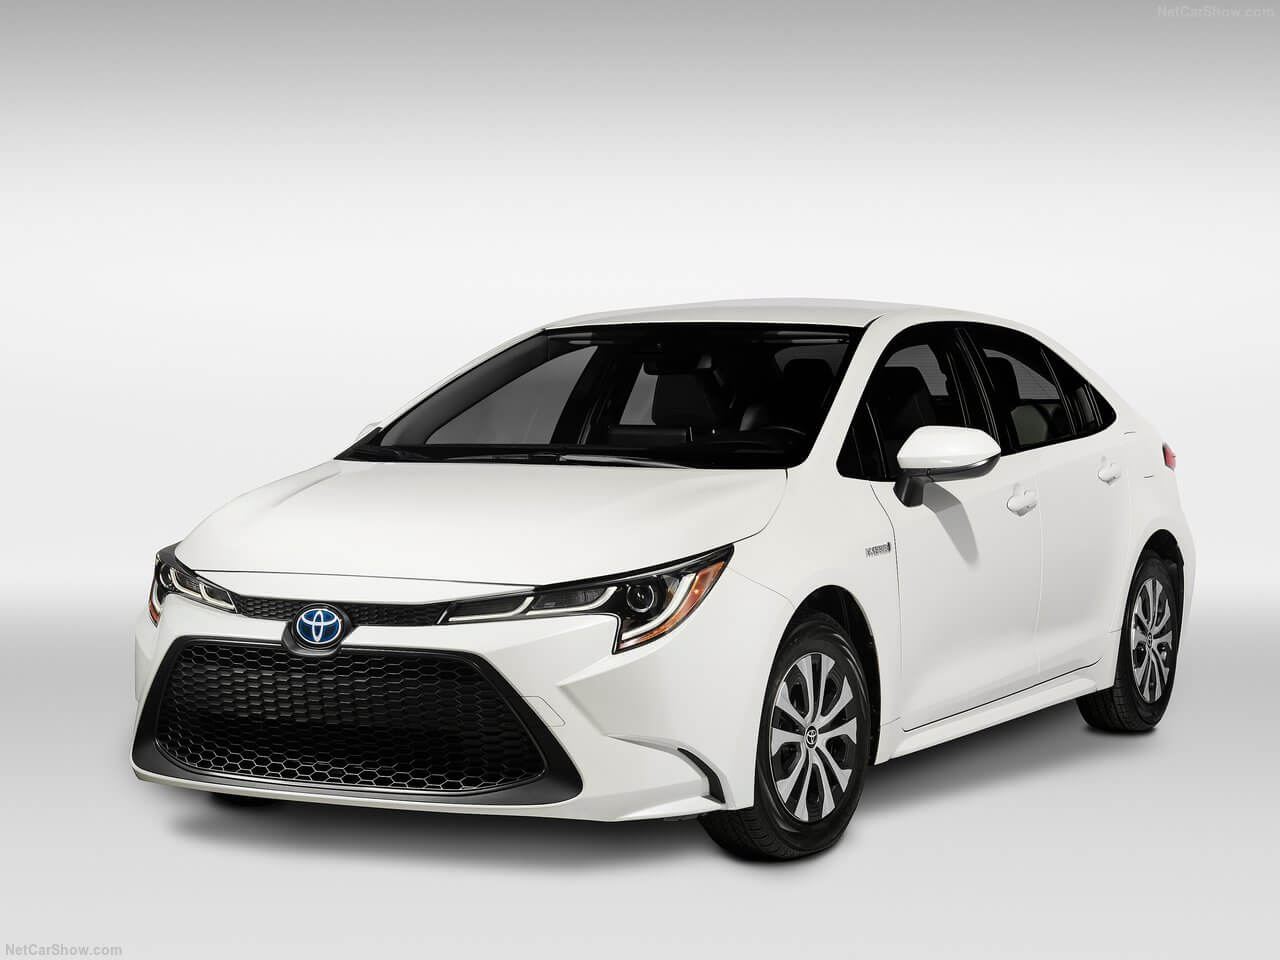 Vista delantera Toyota Corolla hibrido version americana 2020